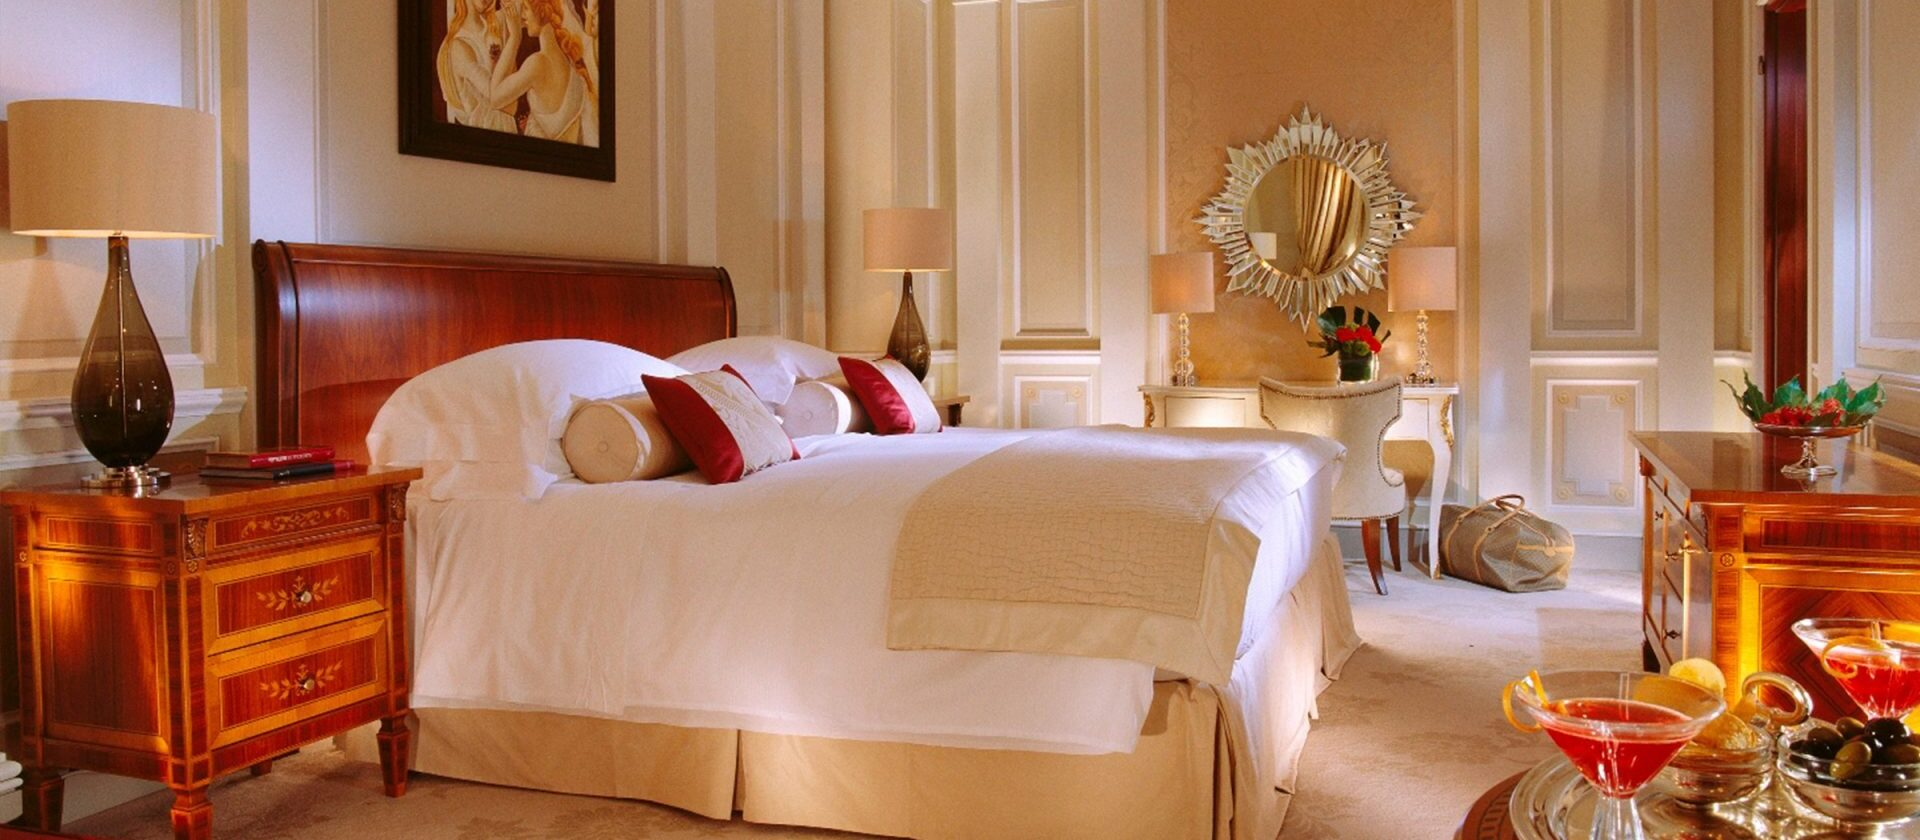 Hotel Principe Di Savoia Principe Suite, Bedroom Landscape